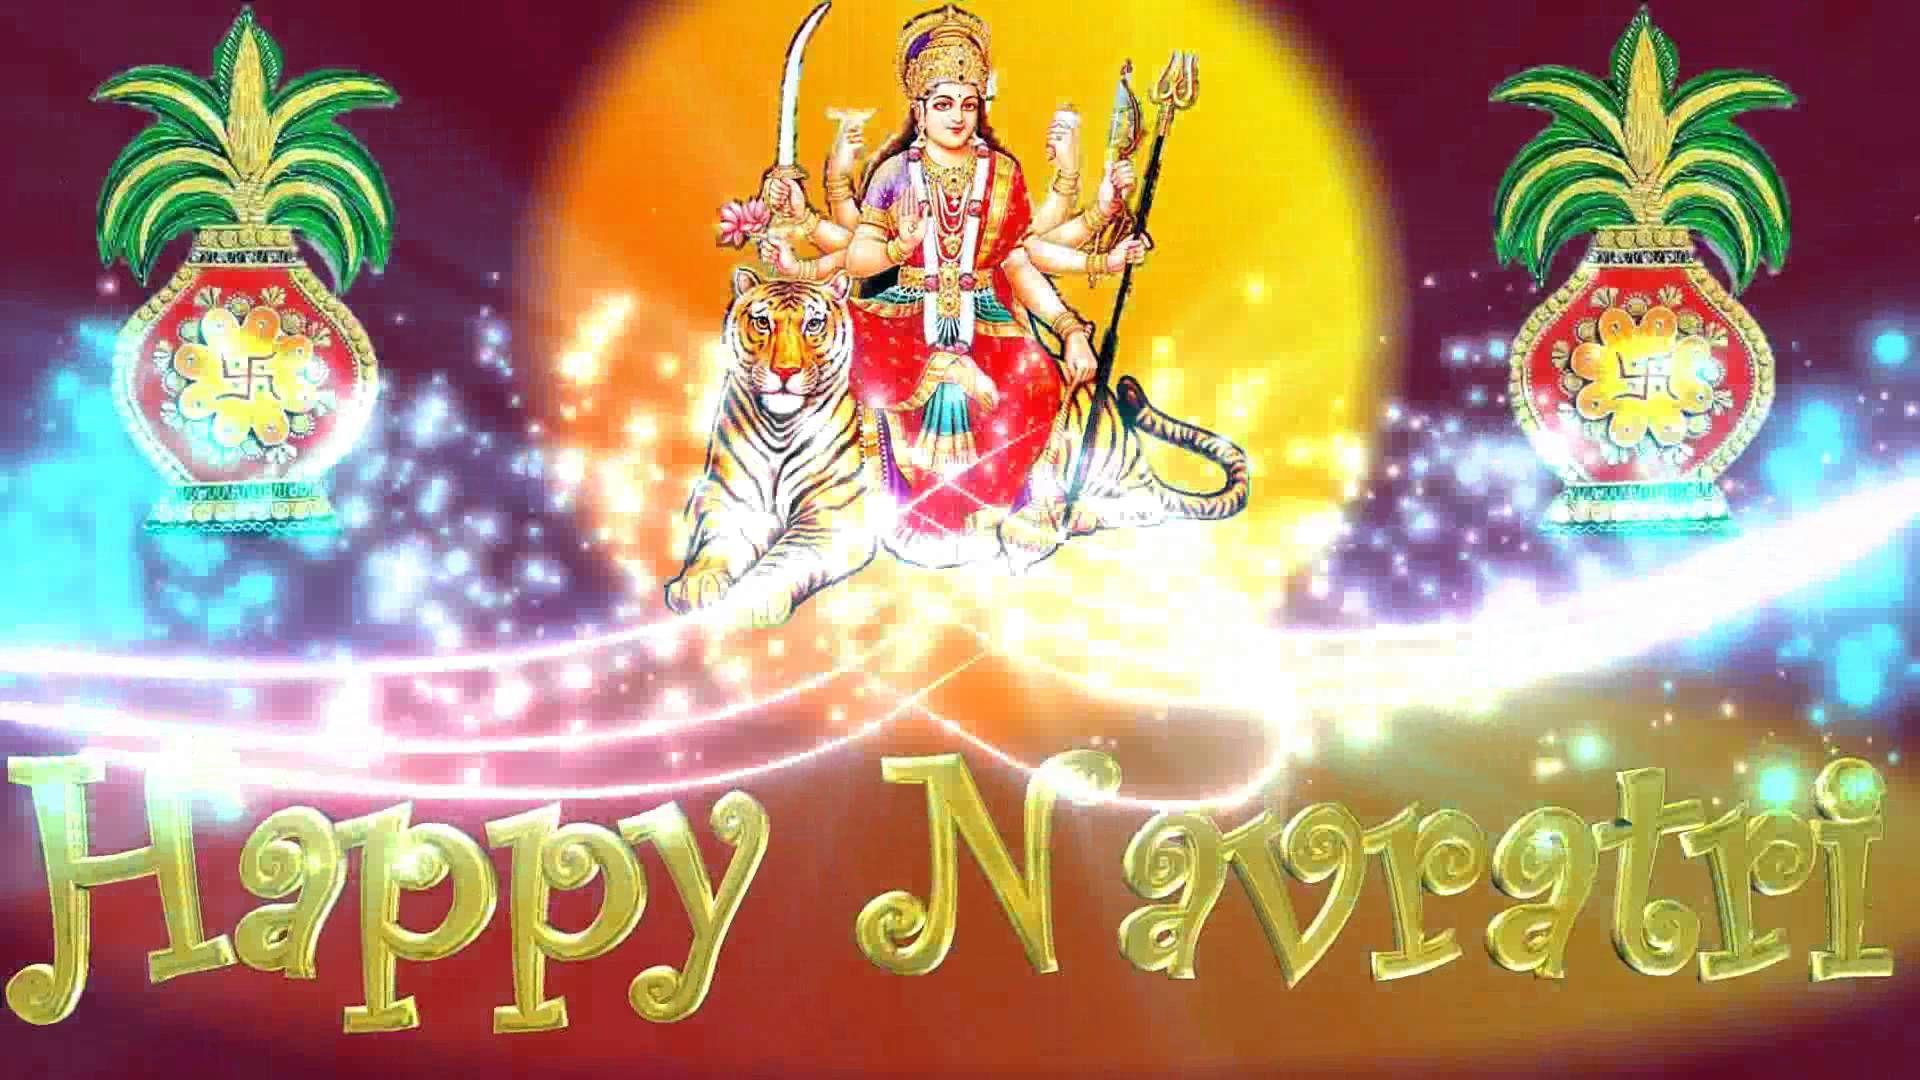 Happy Navratri 2016 Wishesquoteshd Imagesgreetingsecard